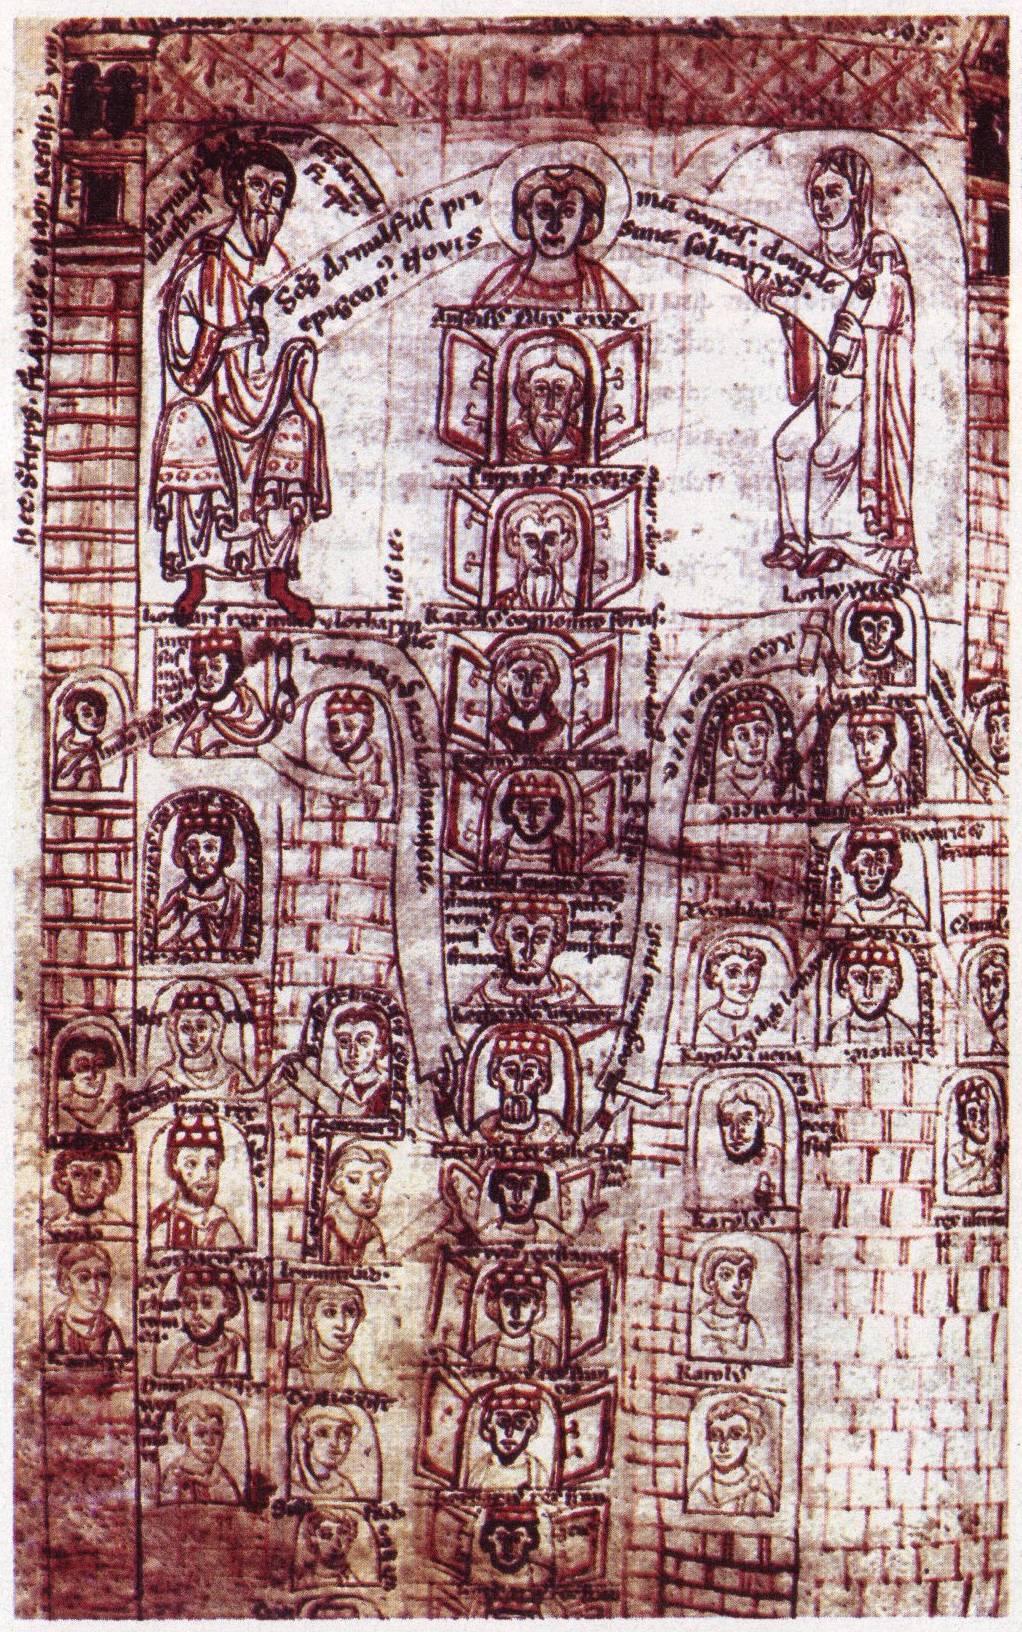 Stammbaum der Karolinger aus dem 12. Jahrhundert, public domain